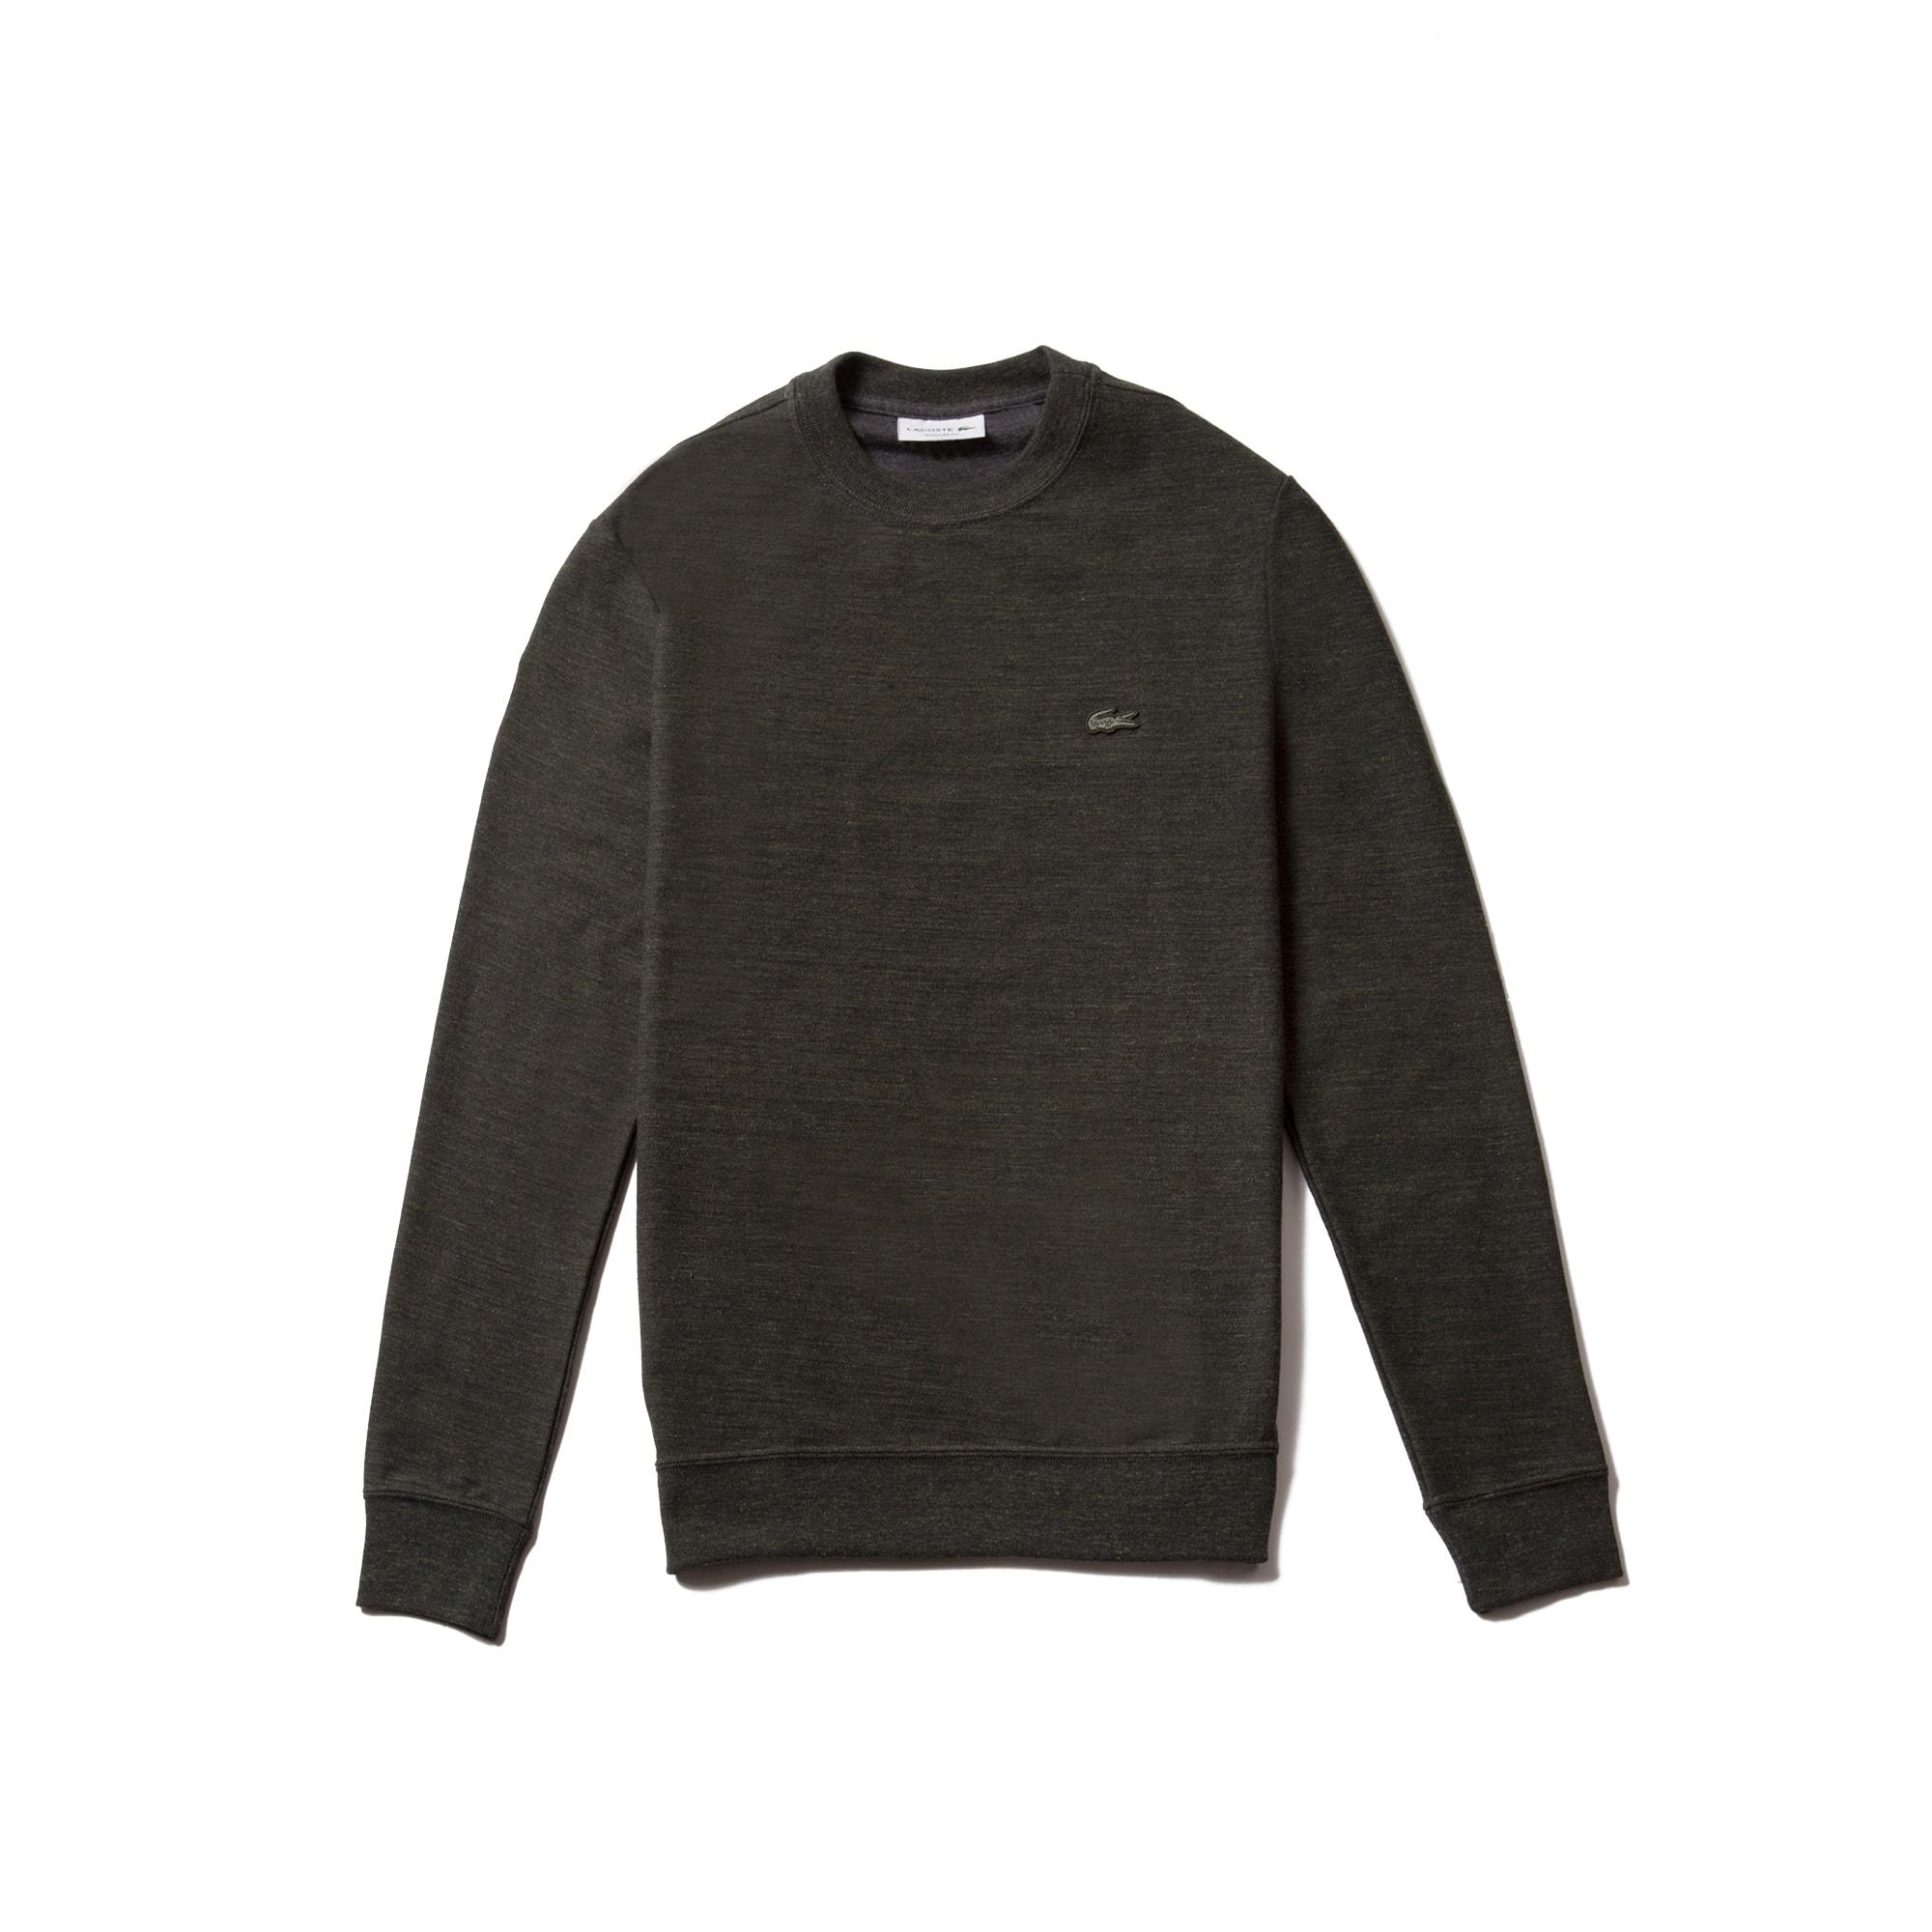 Men's Fleece T-shirt